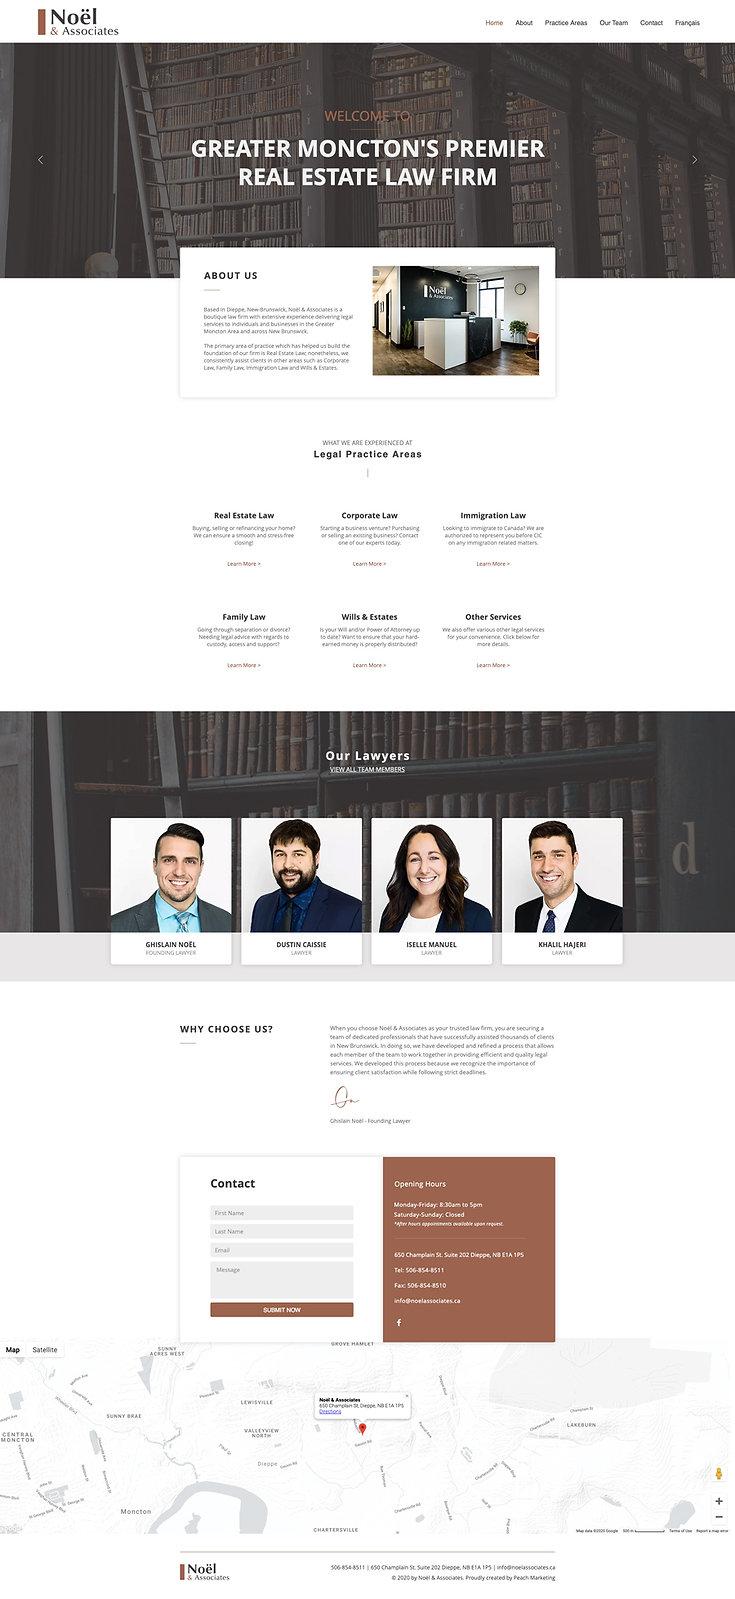 Website noel associates.jpg